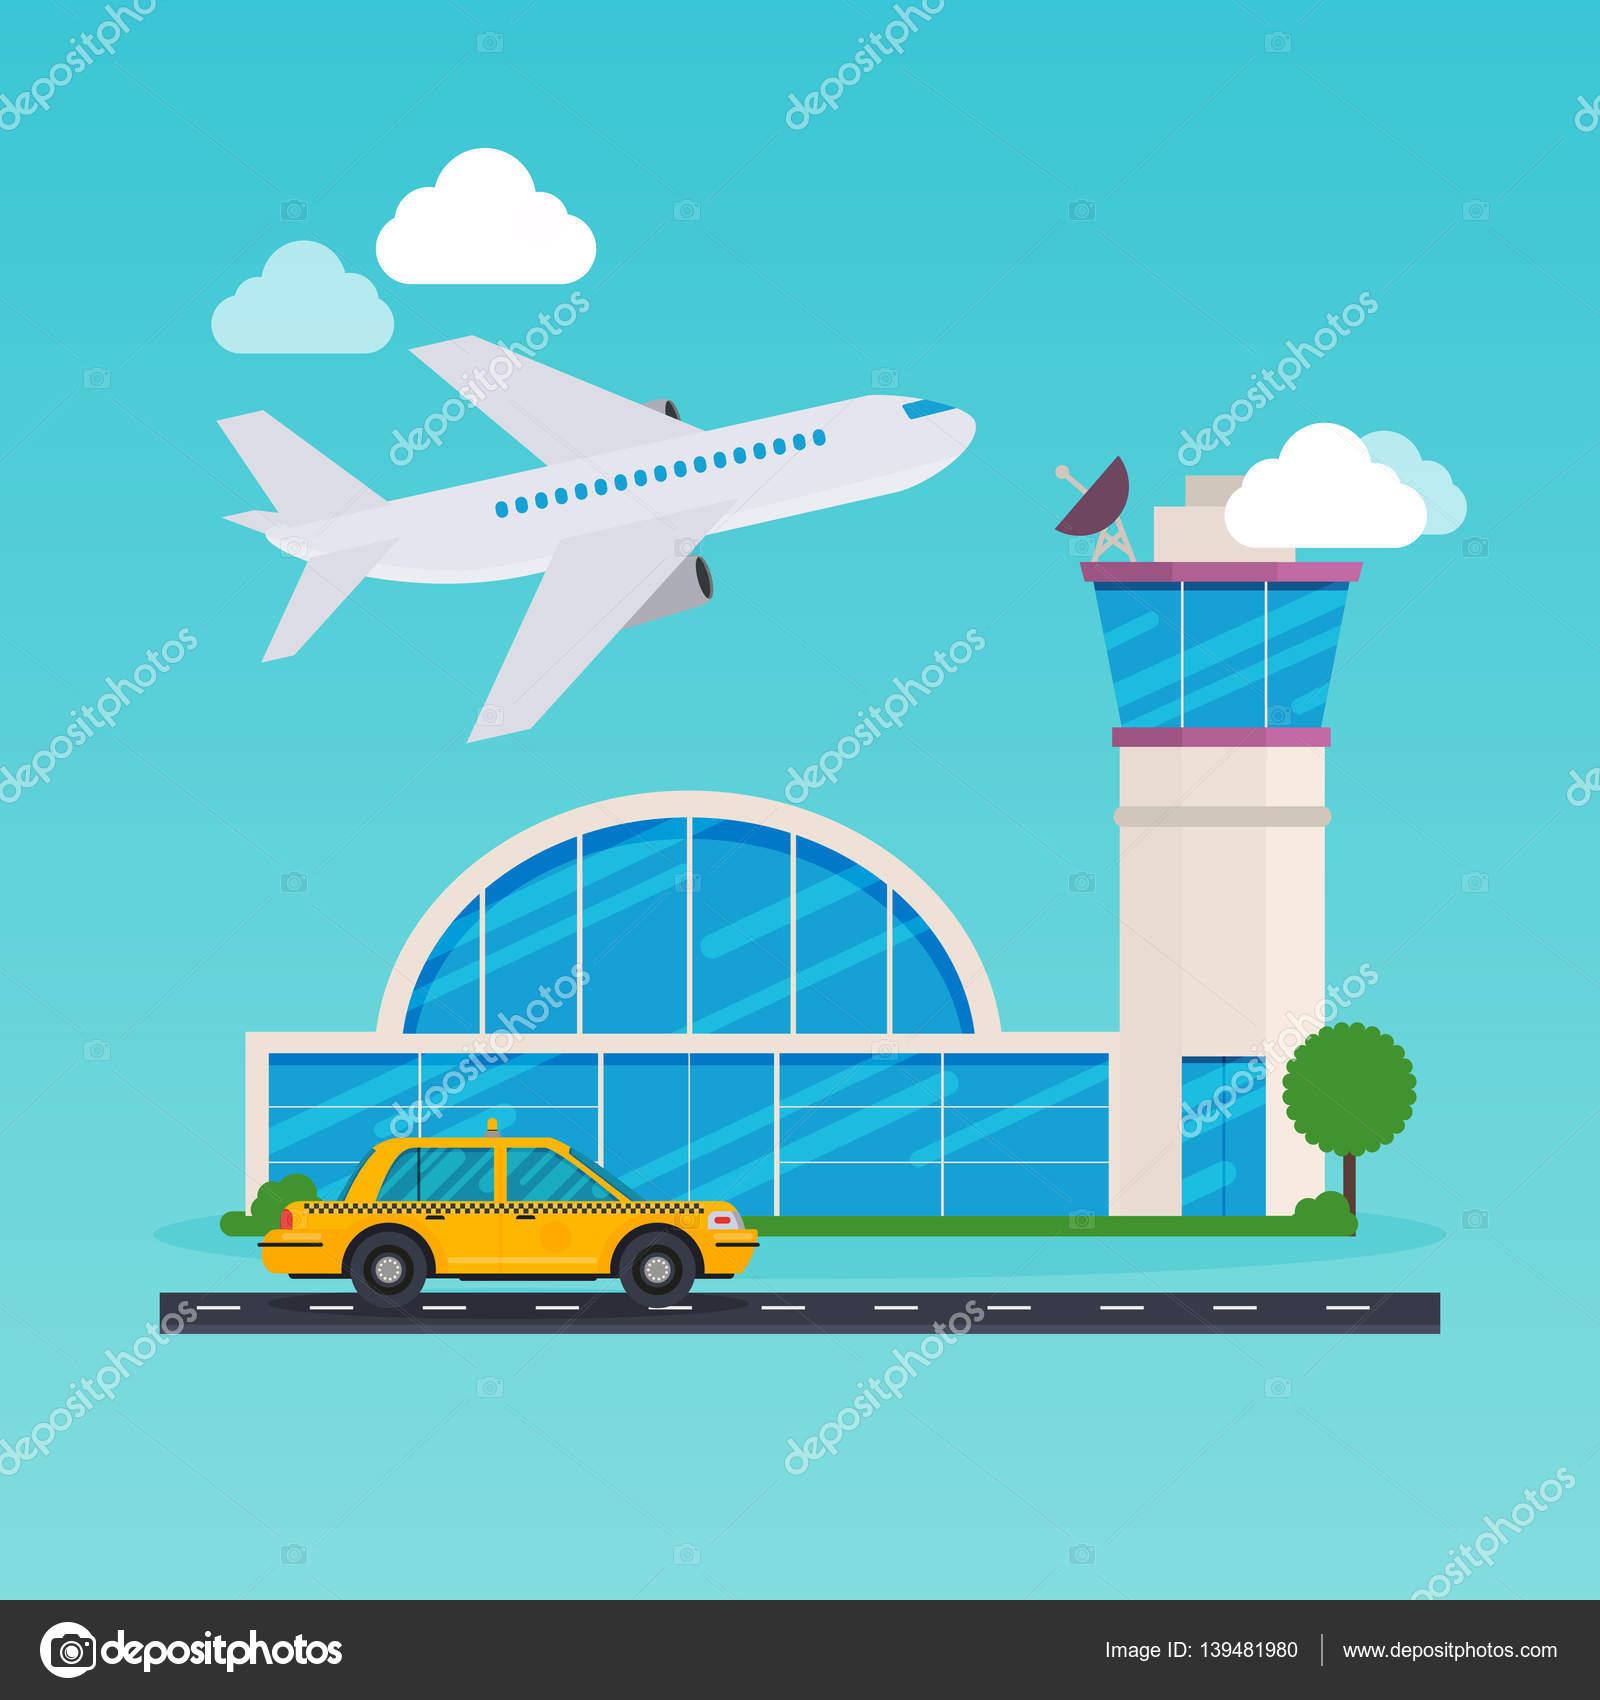 cute cartoon airport �... Airport Cartoon Images